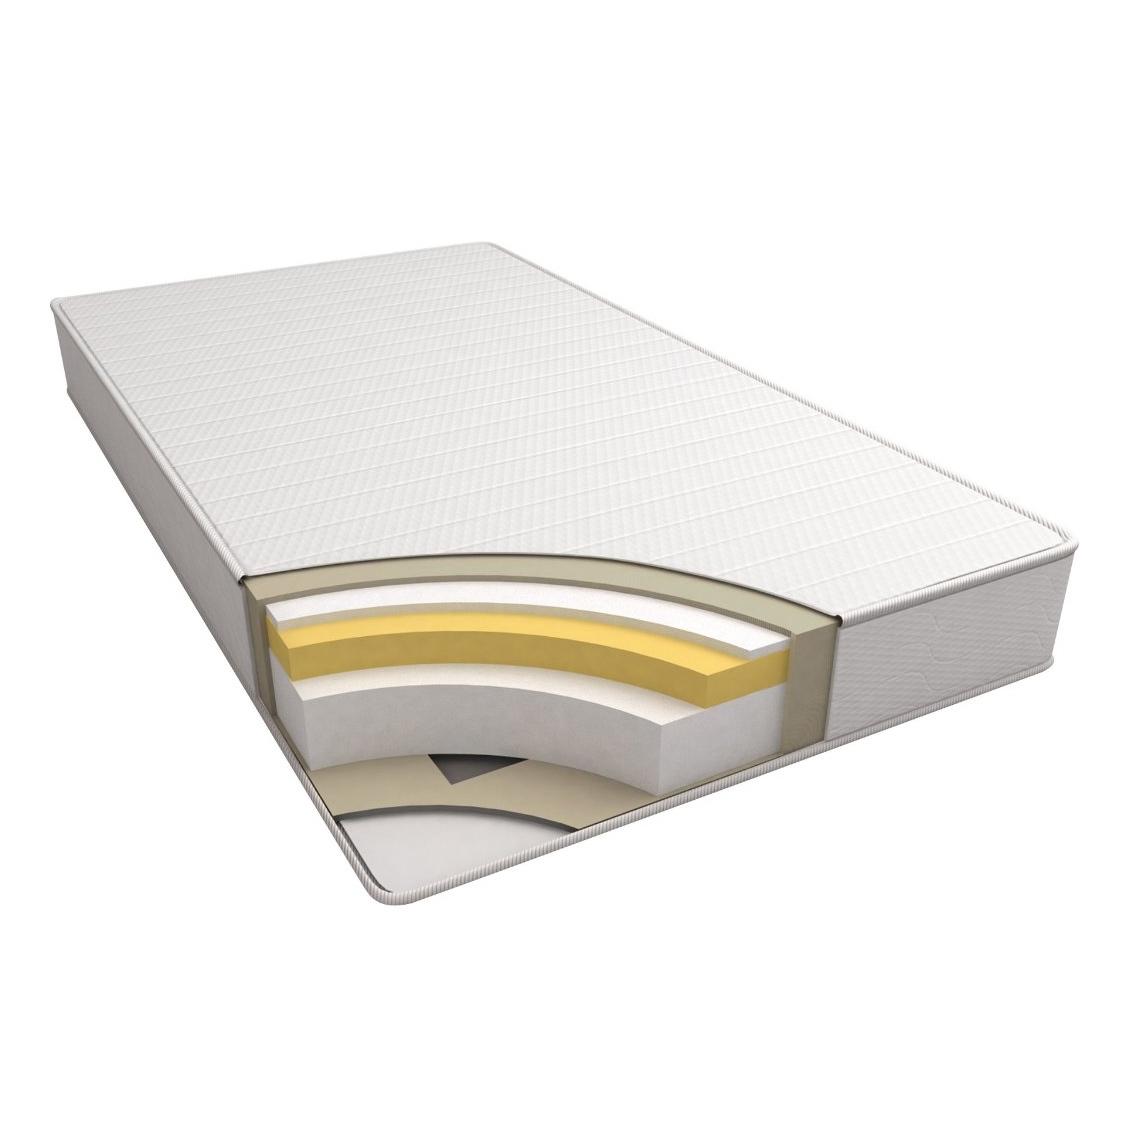 - Twin Size 6-inch Thick Memory Foam Mattress